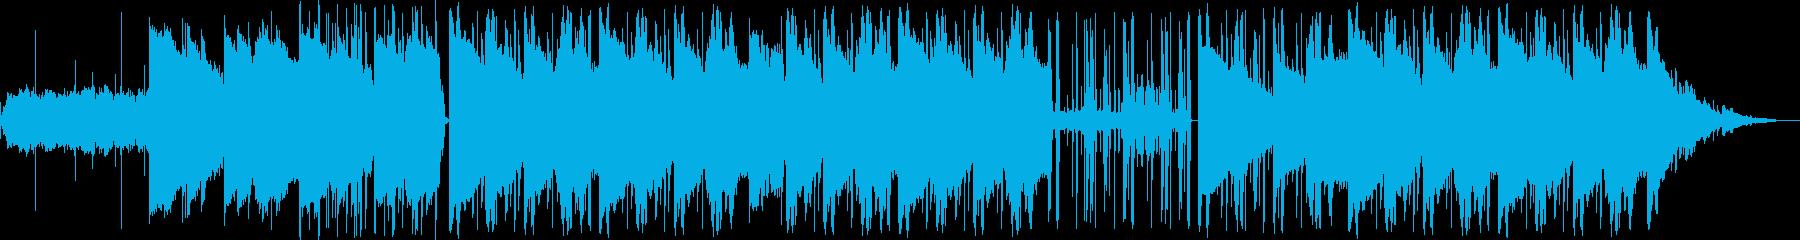 lo-fi hip-hop の再生済みの波形